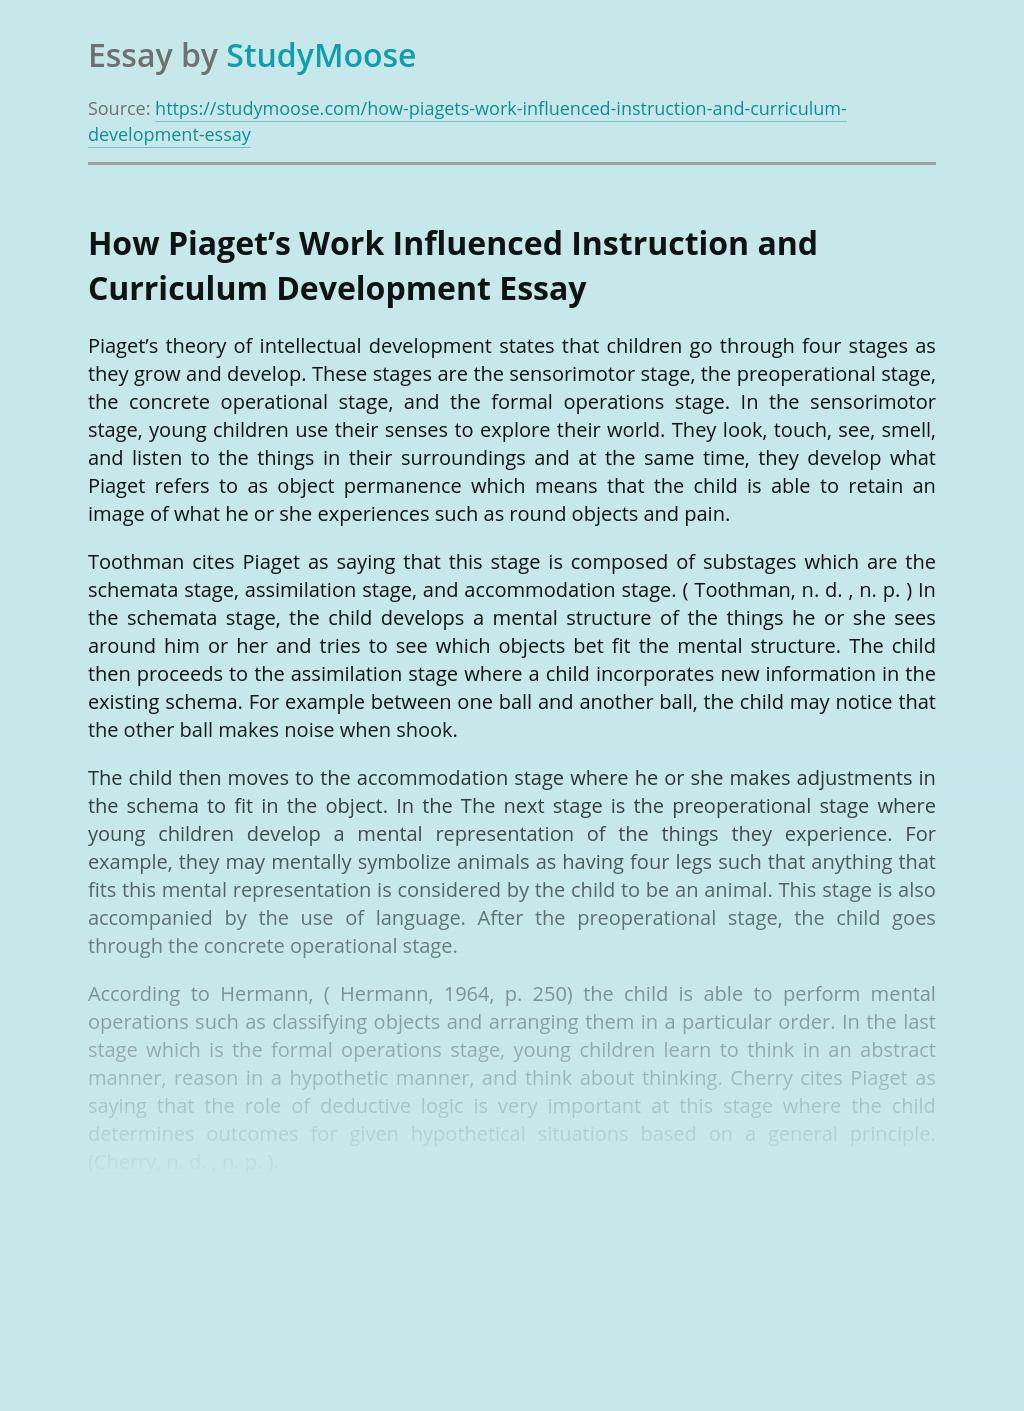 How Piaget's Work Influenced Instruction and Curriculum Development